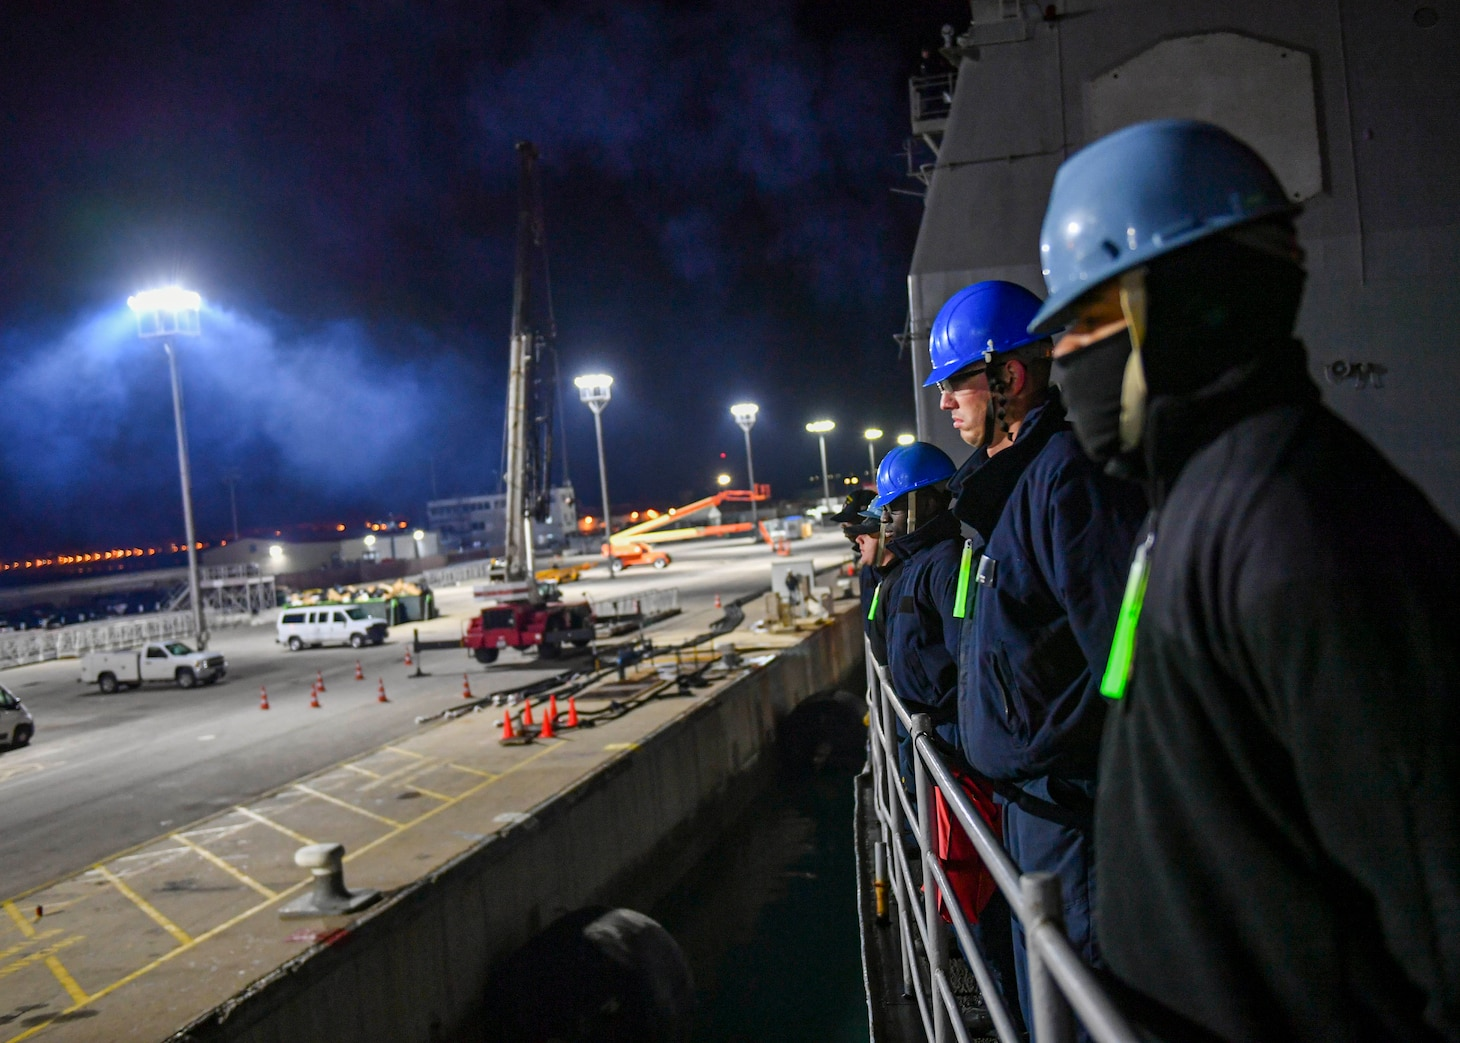 Rota, Spain, USS Normandy (CG 60), Port visit